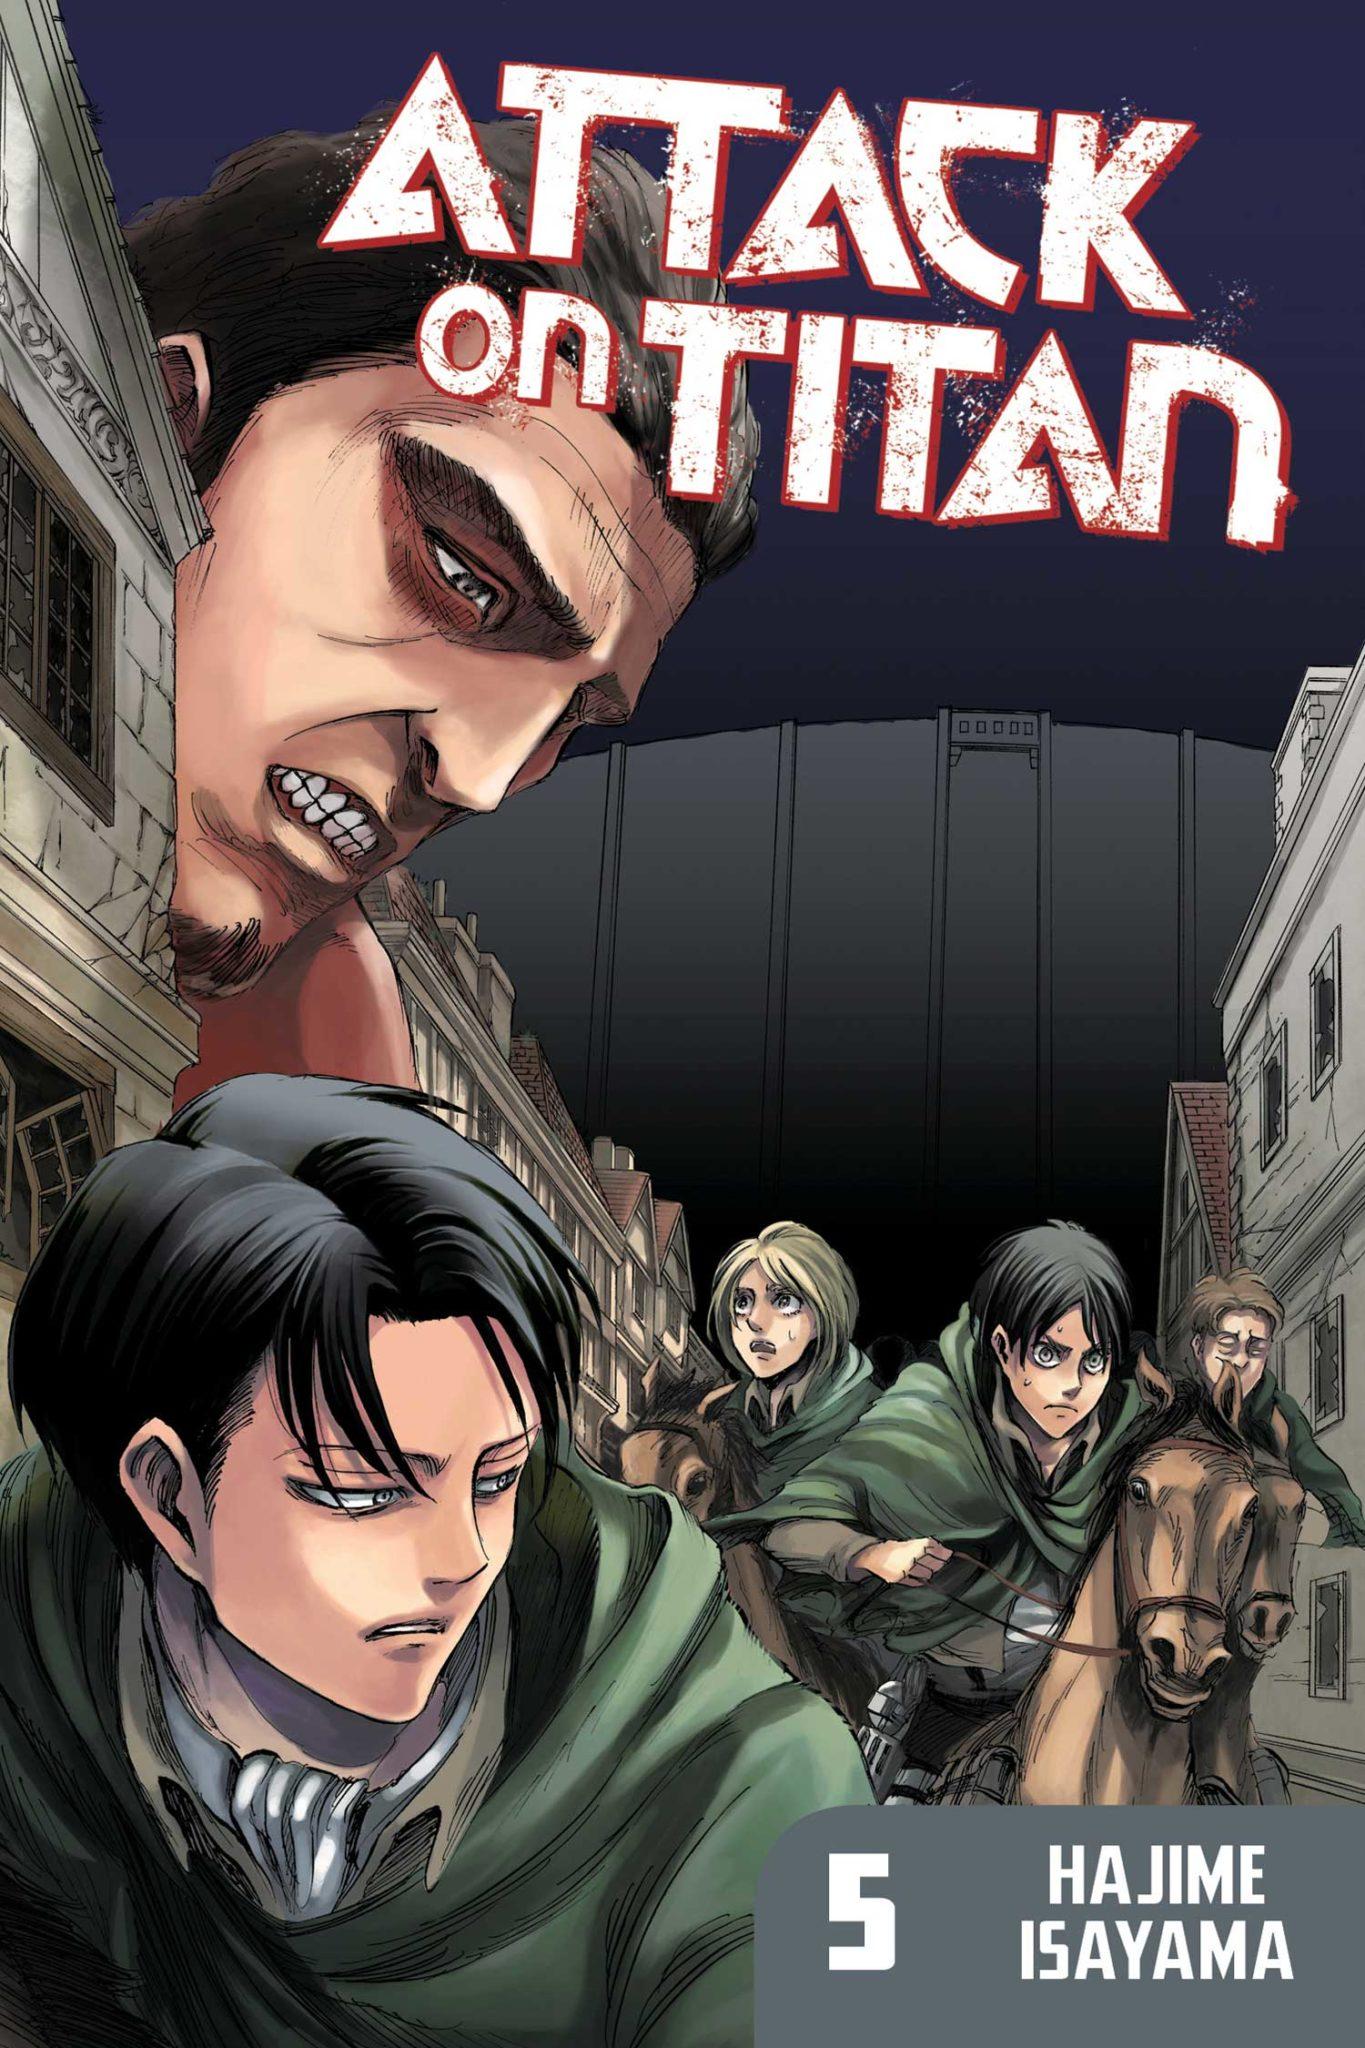 Attack on Titan, Volume 5 by Hajime Isayama